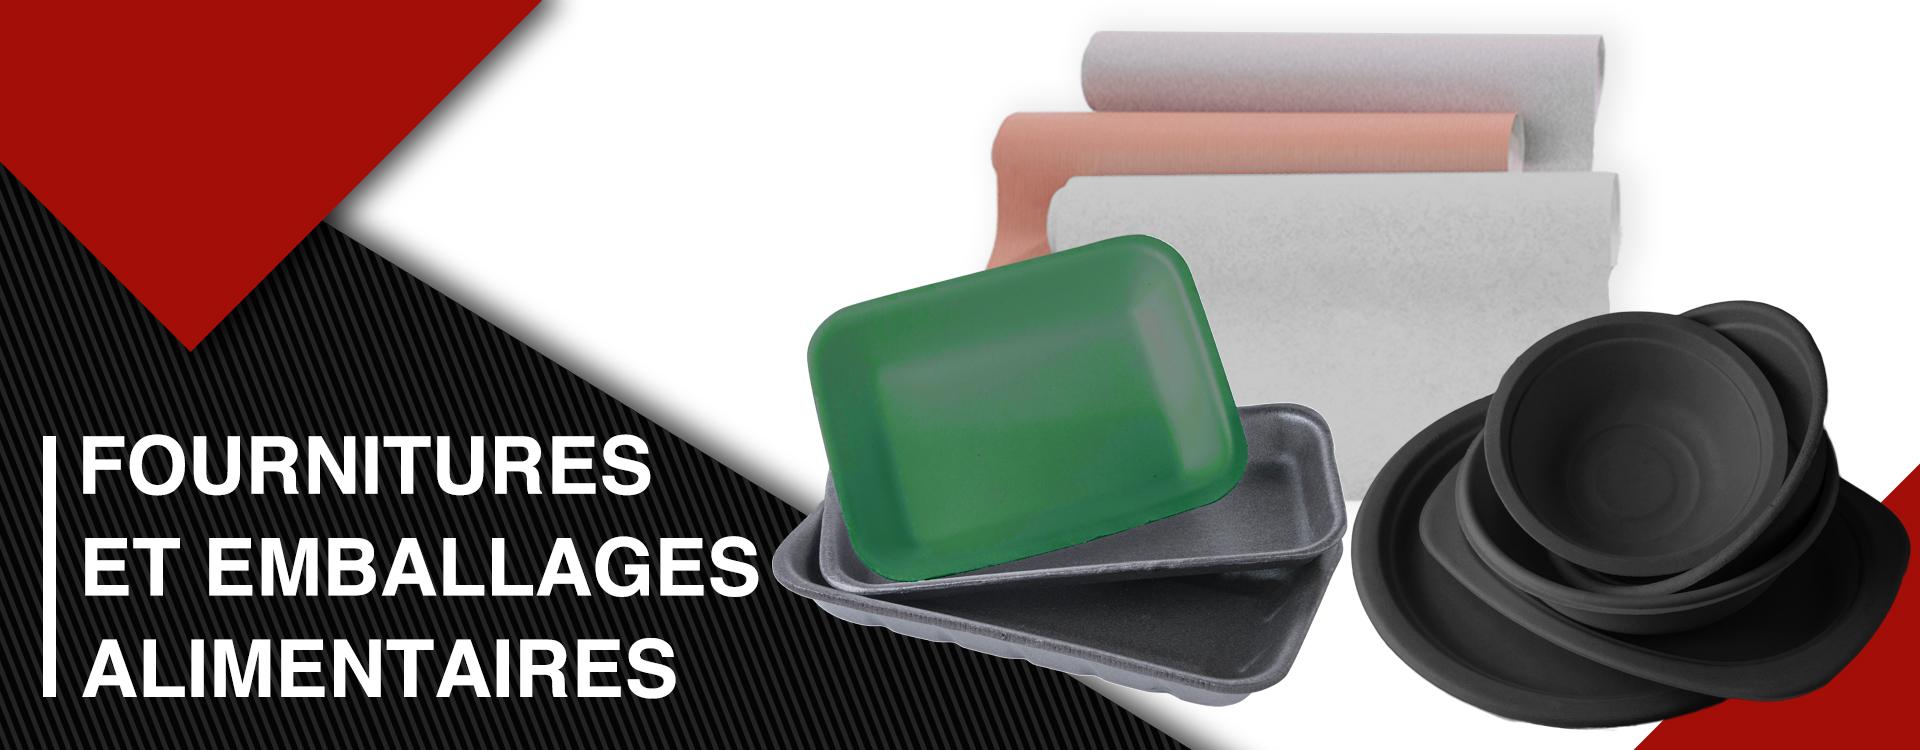 arteau-emballages-alimentaires-slider-1920×750